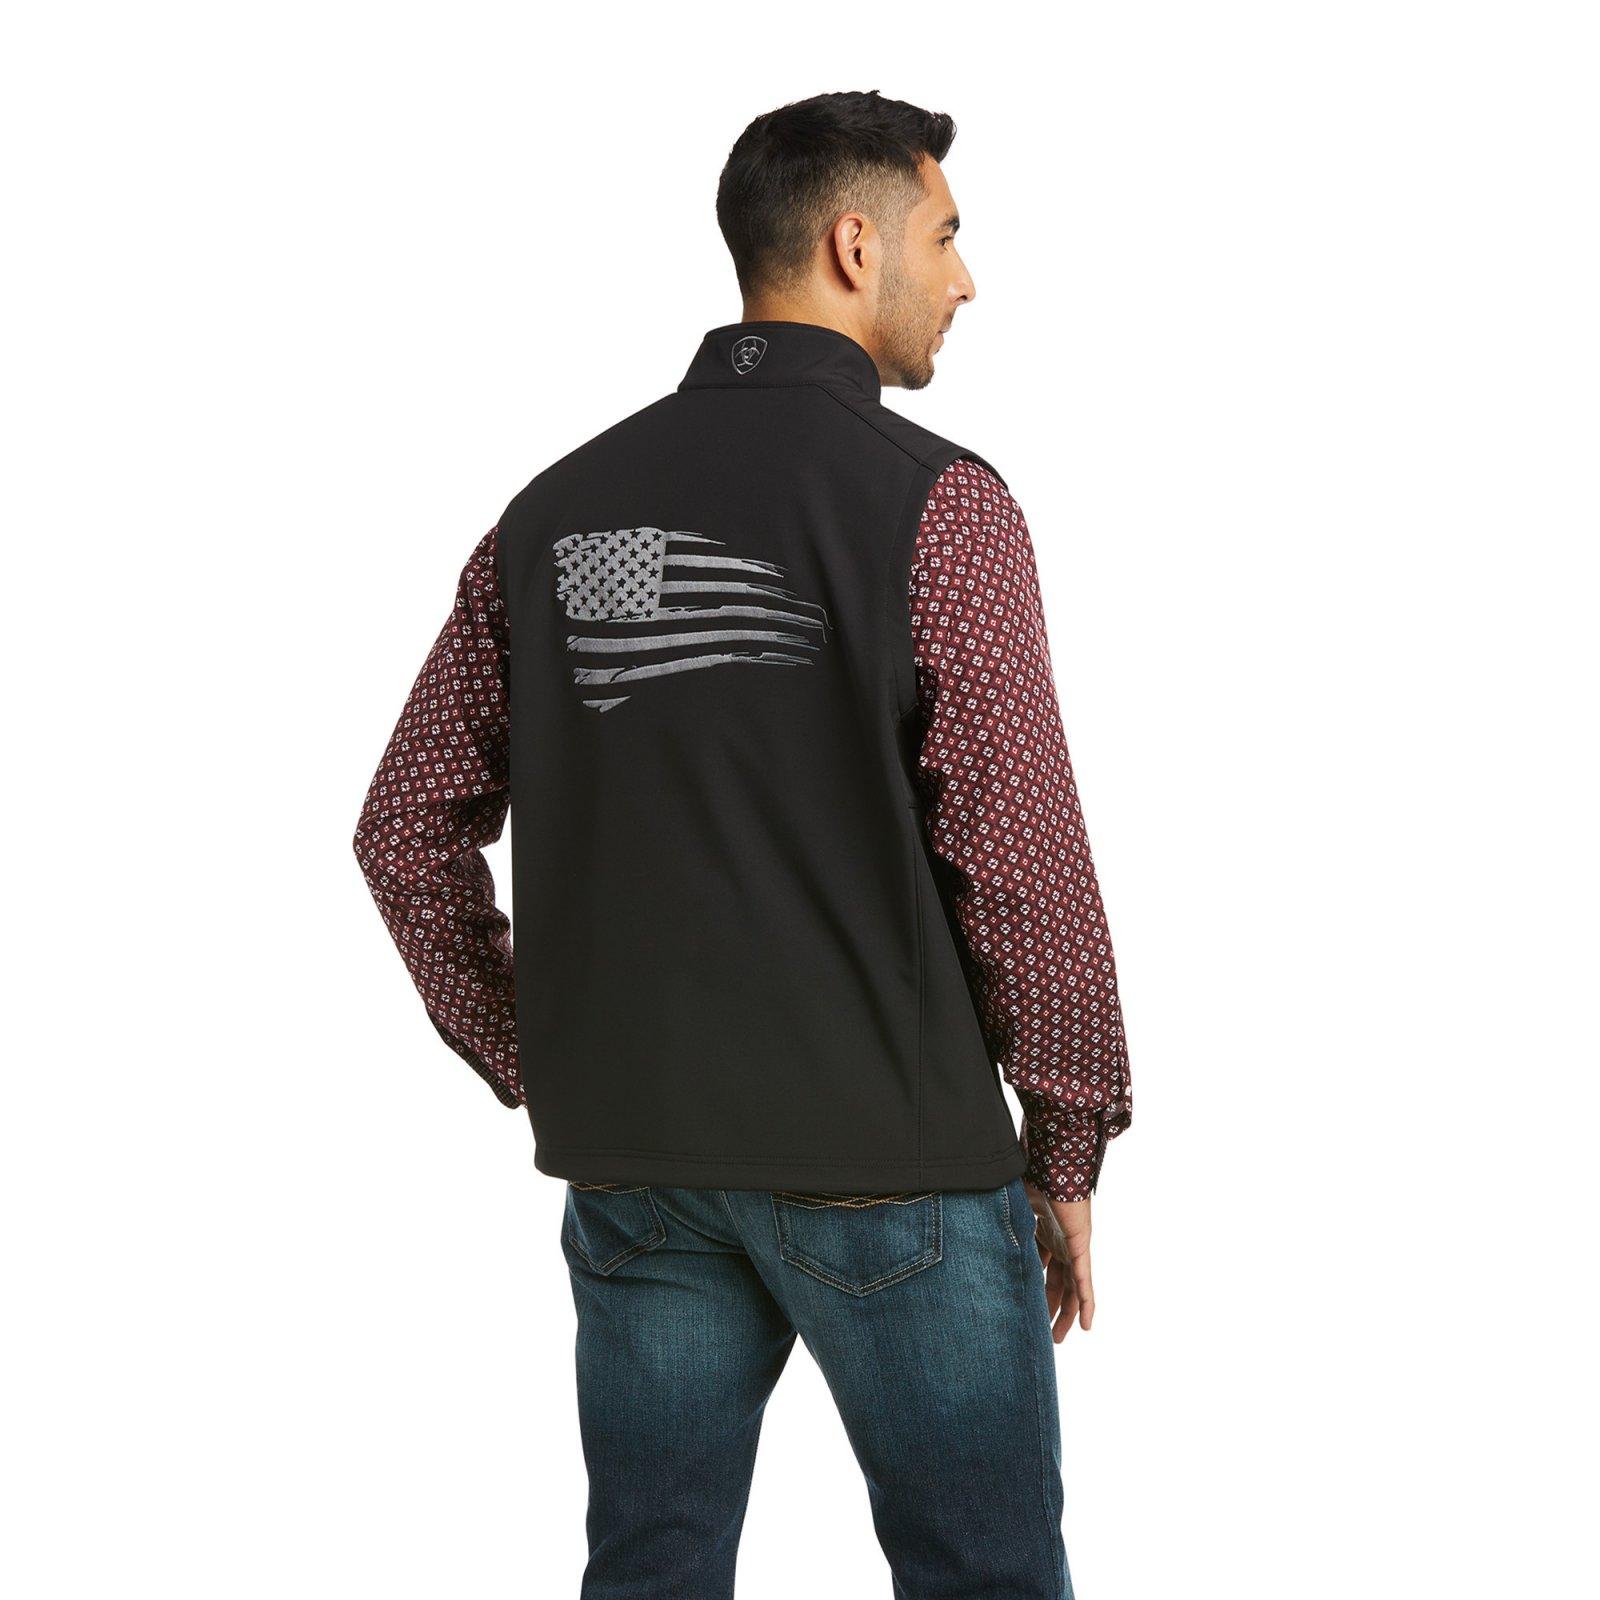 2.0 Patriot Softshell Vest from Ariat